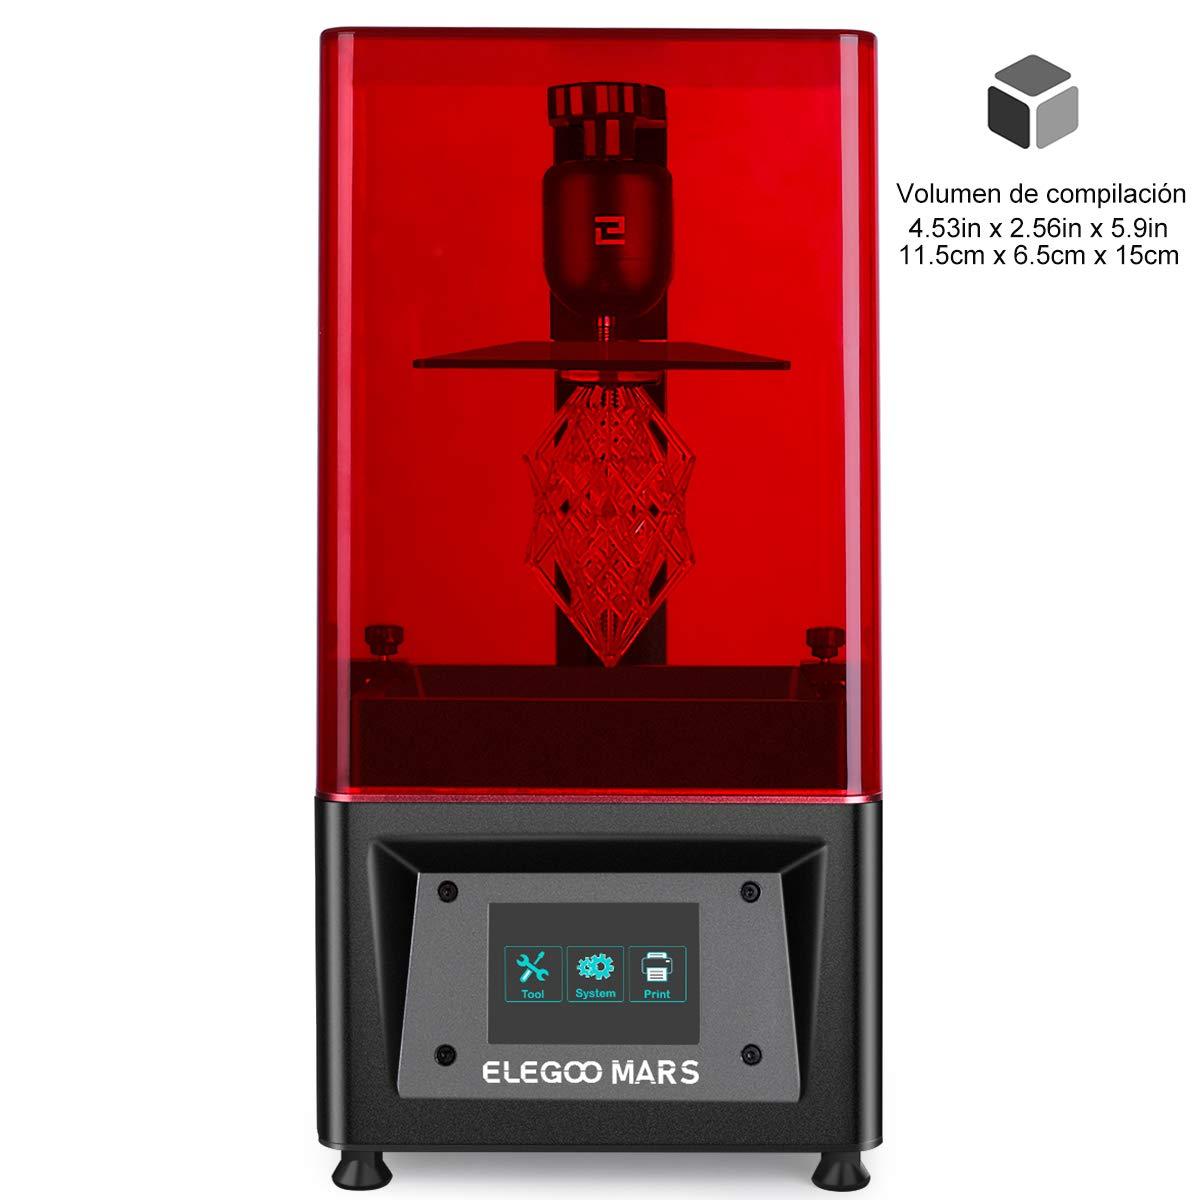 Impresora 3D de resina ELEGOO MARS 39€ mas barata